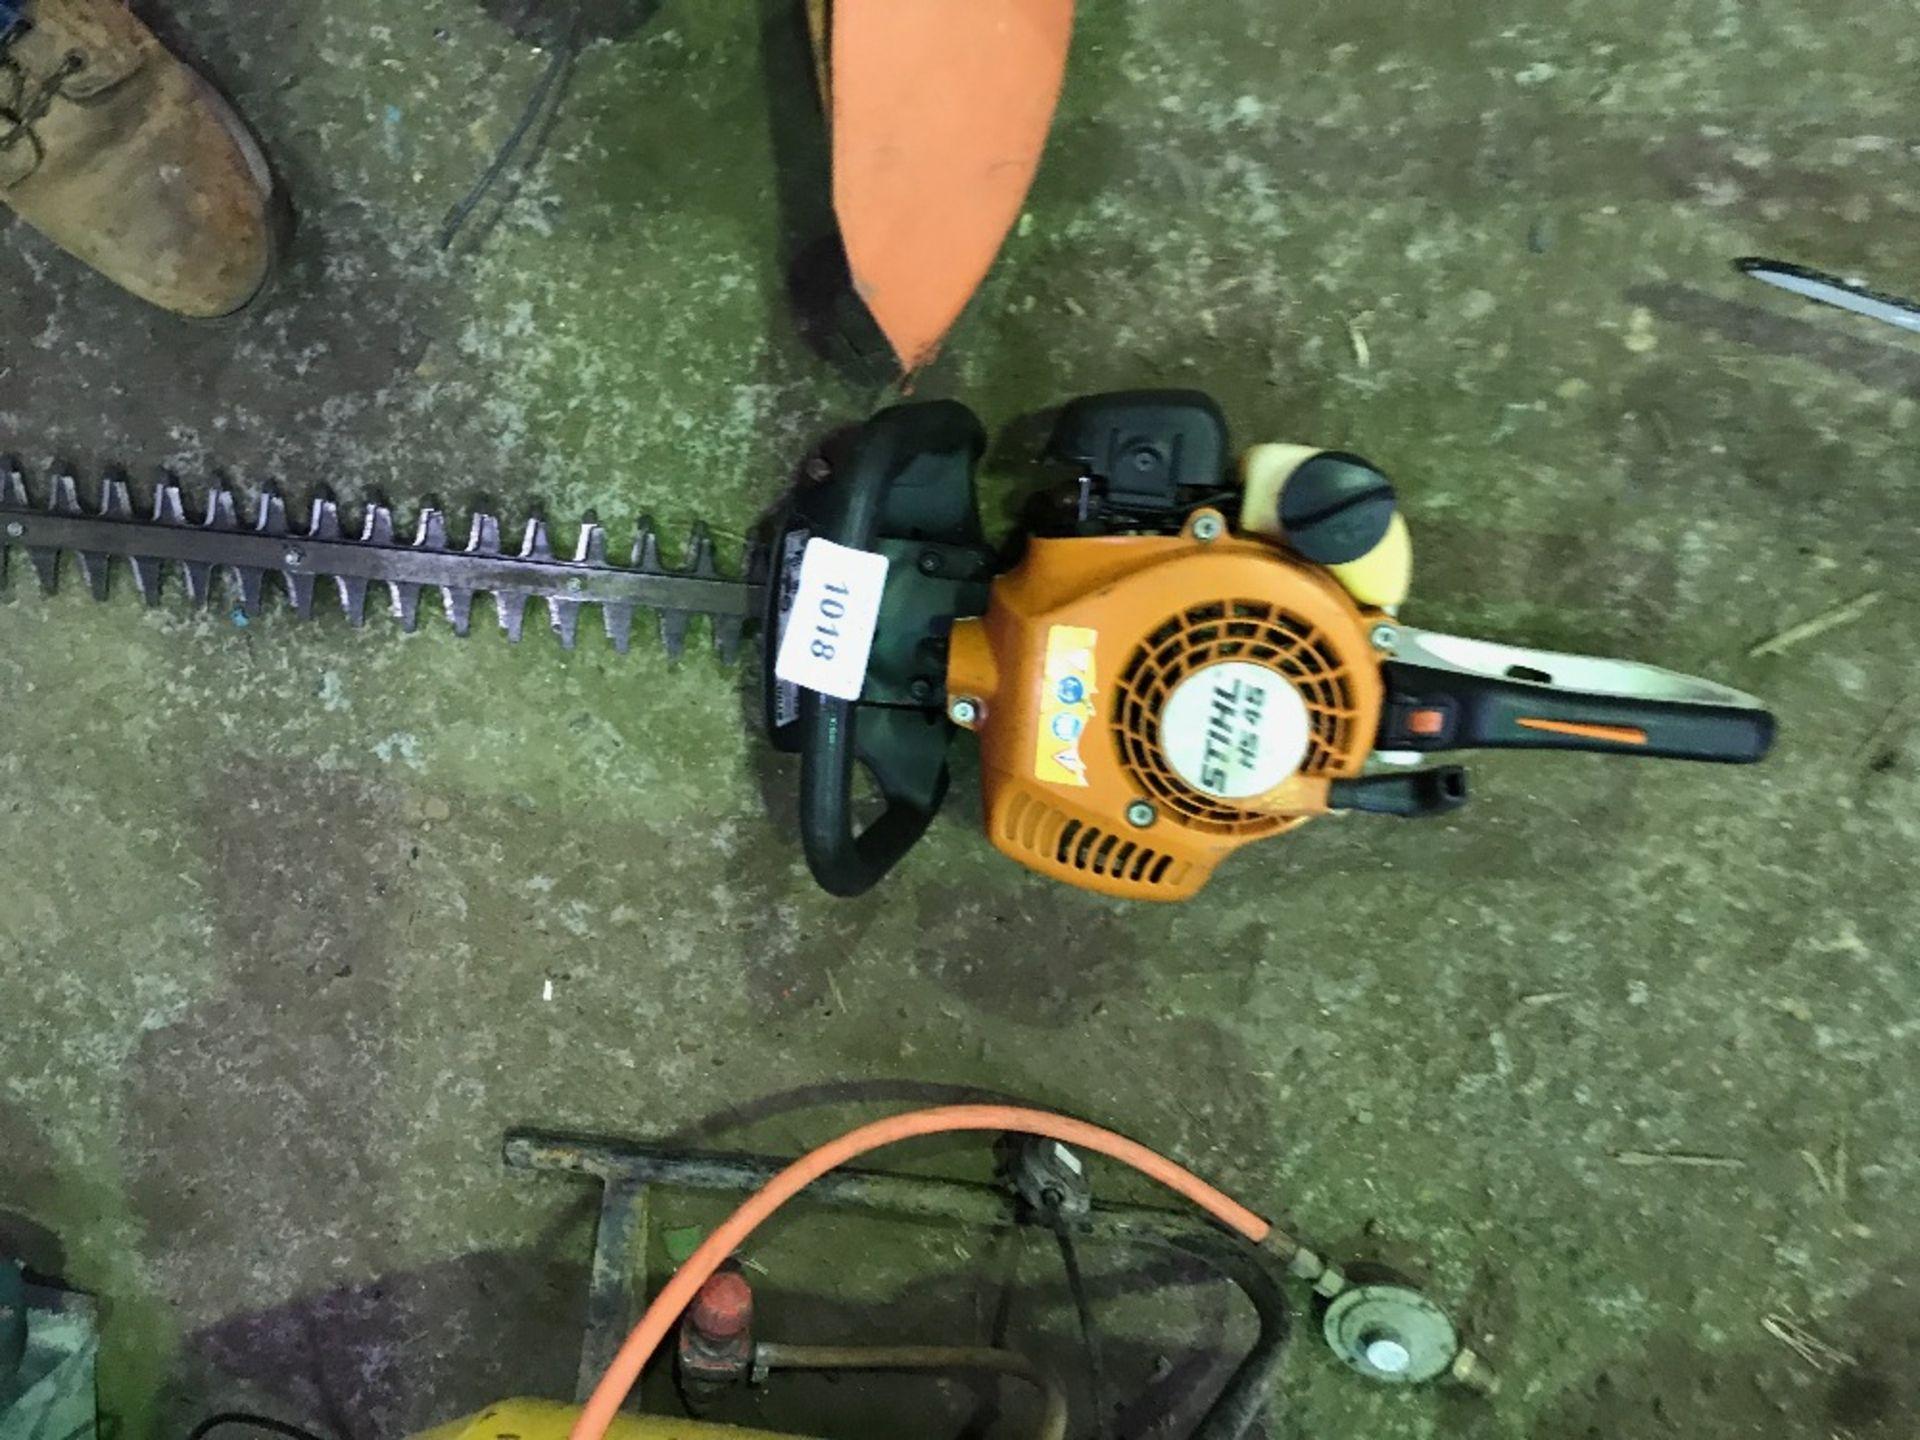 Lot 1018 - Stihl HS45 petrol hedge cutter